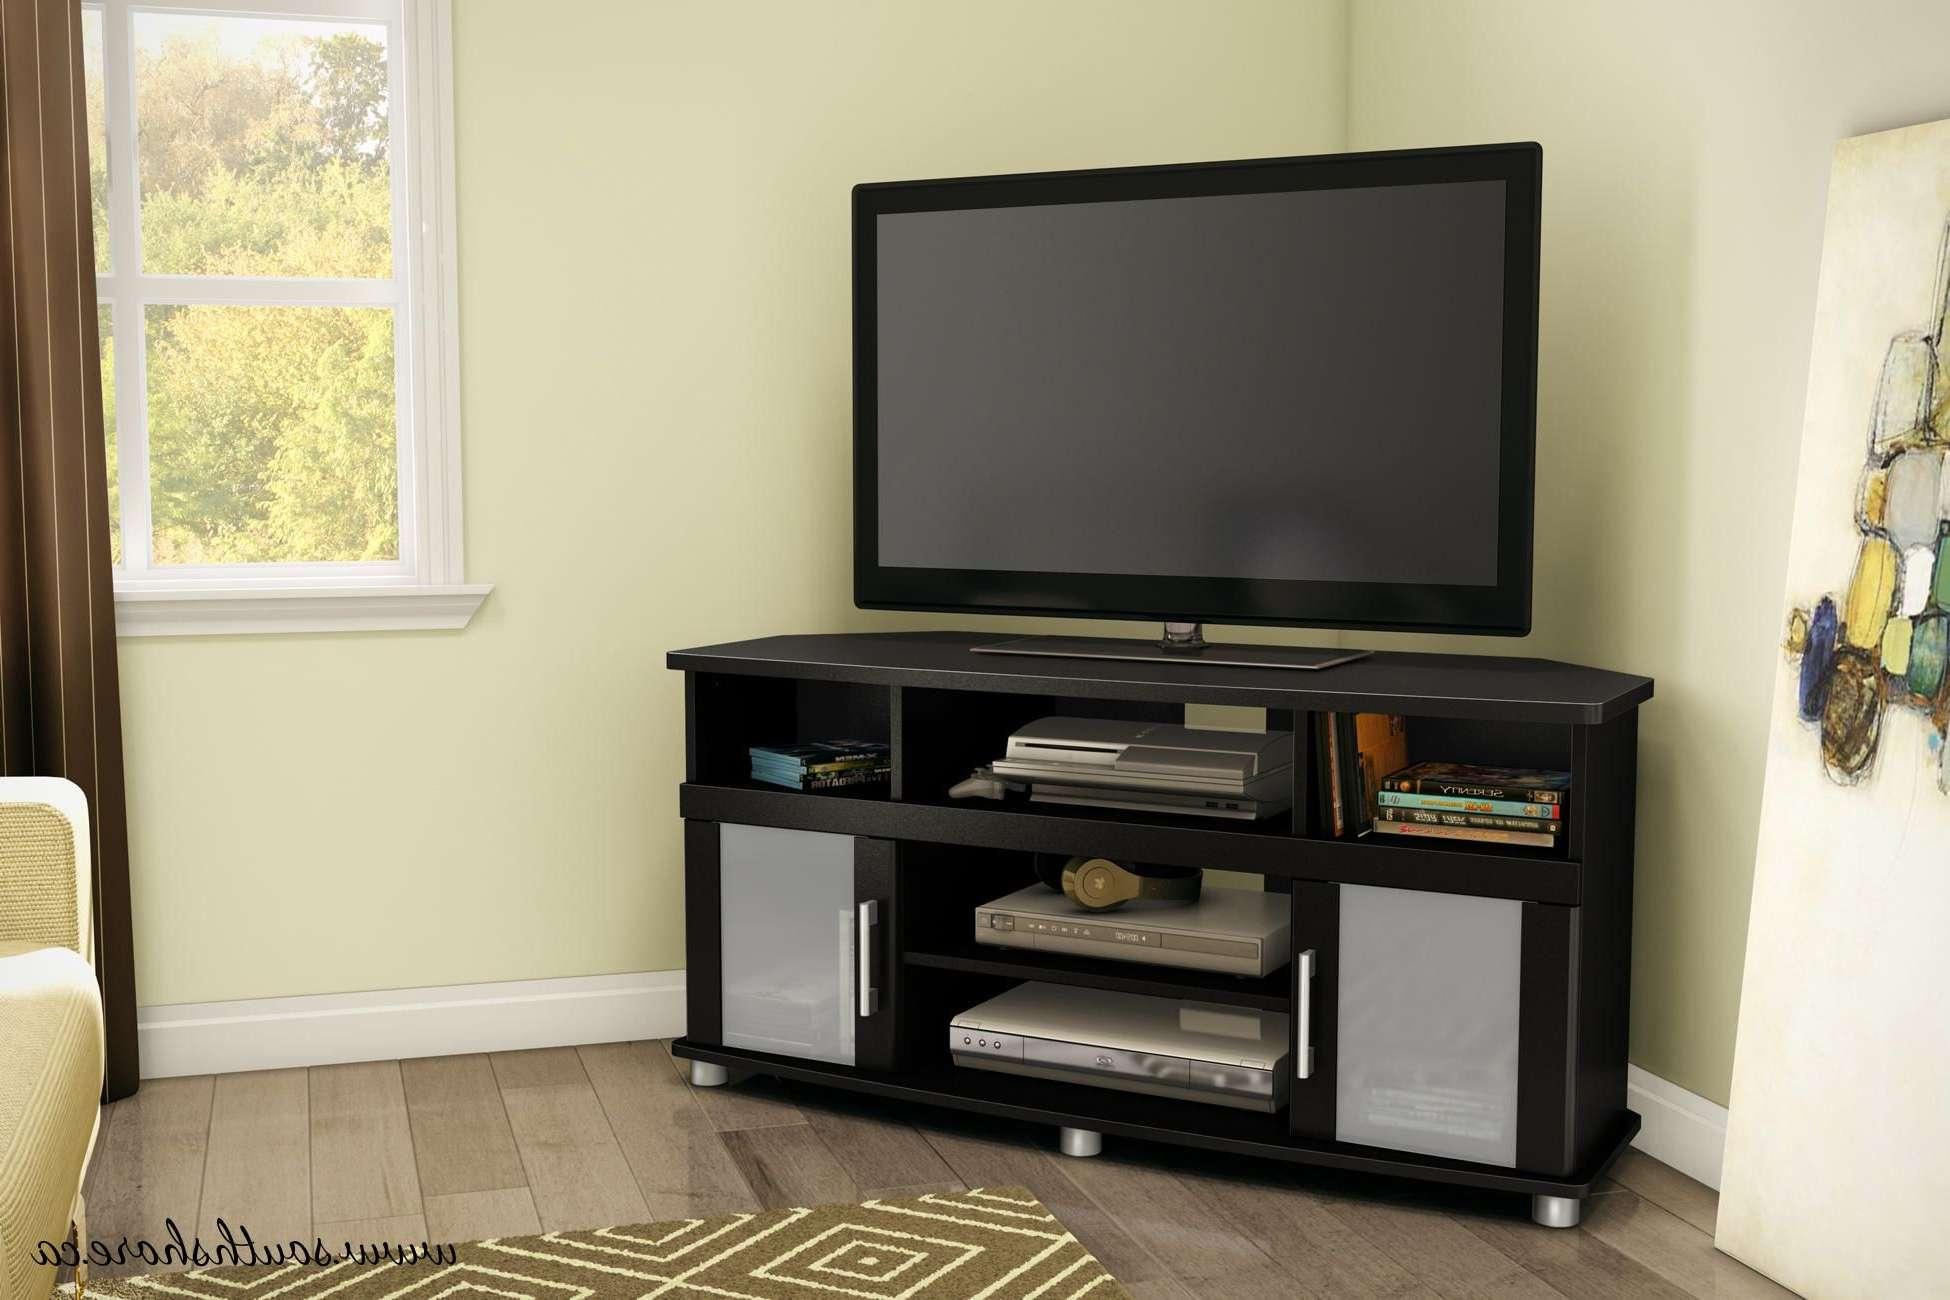 Storage Cabinets Ideas : Corner Tv Cabinet Cream Choosing The With Regard To Cream Corner Tv Stands (View 12 of 15)